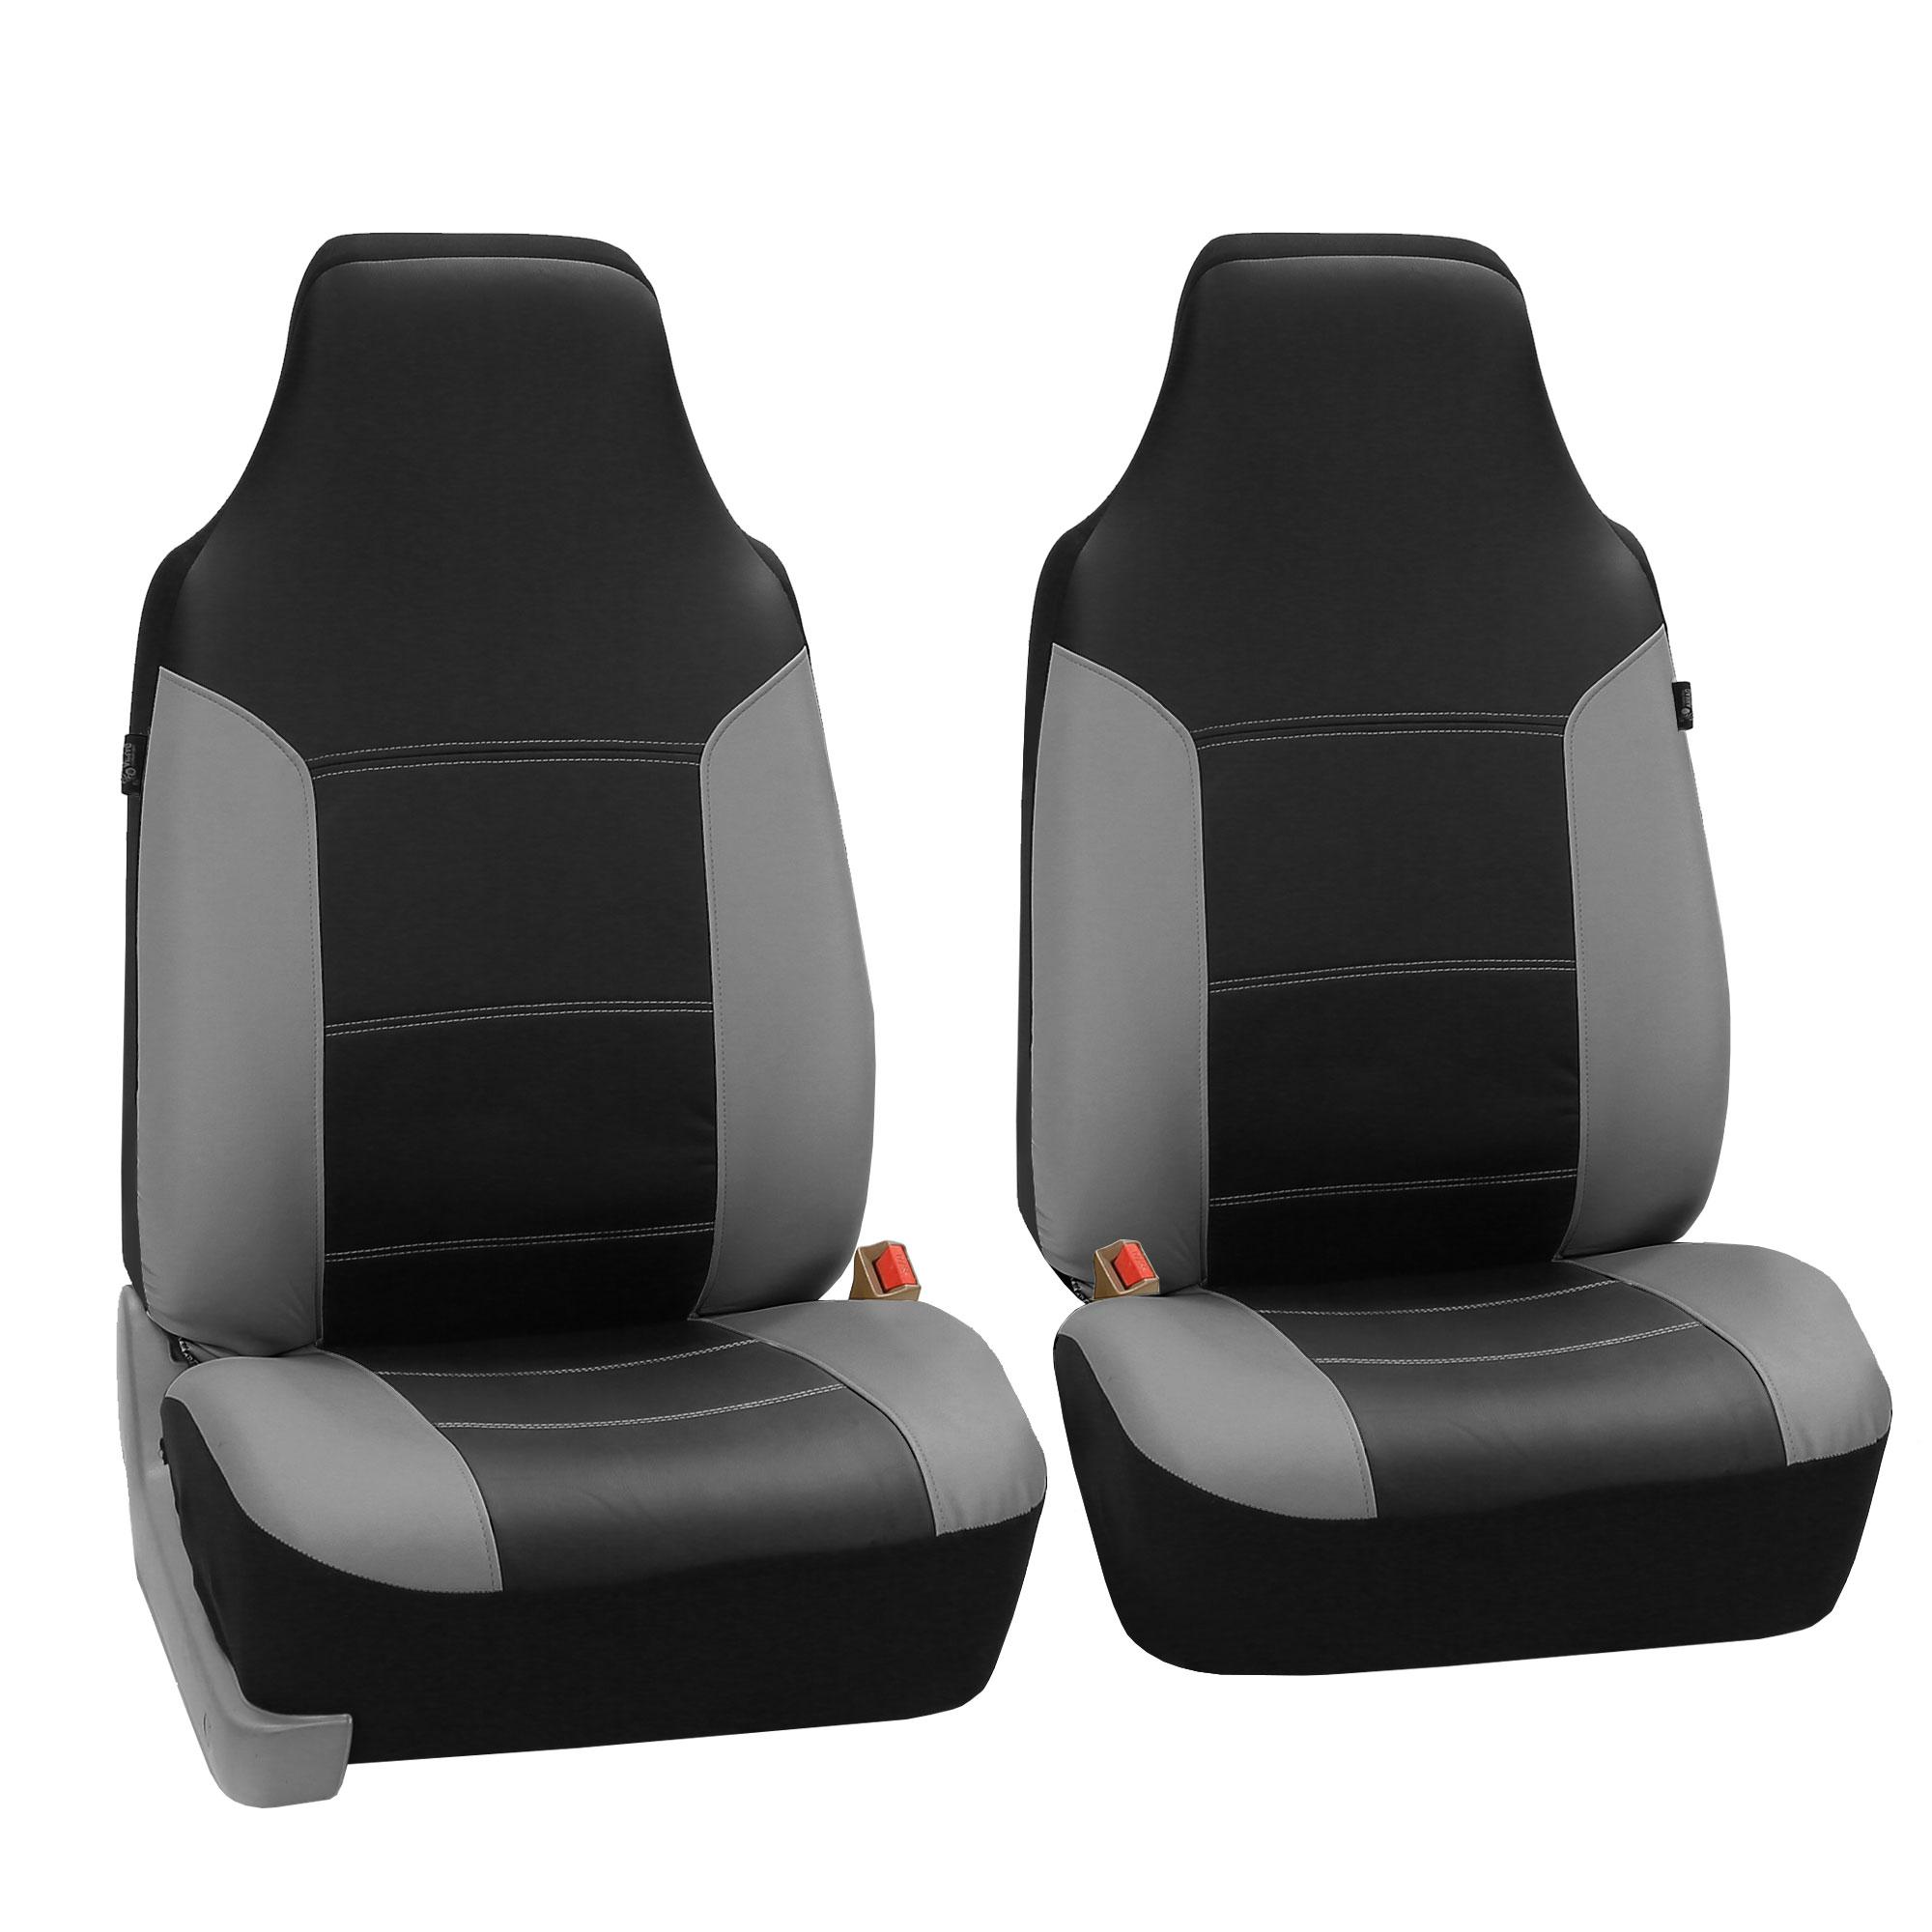 faux leather gray black car seat cover set headrests floor mat set. Black Bedroom Furniture Sets. Home Design Ideas